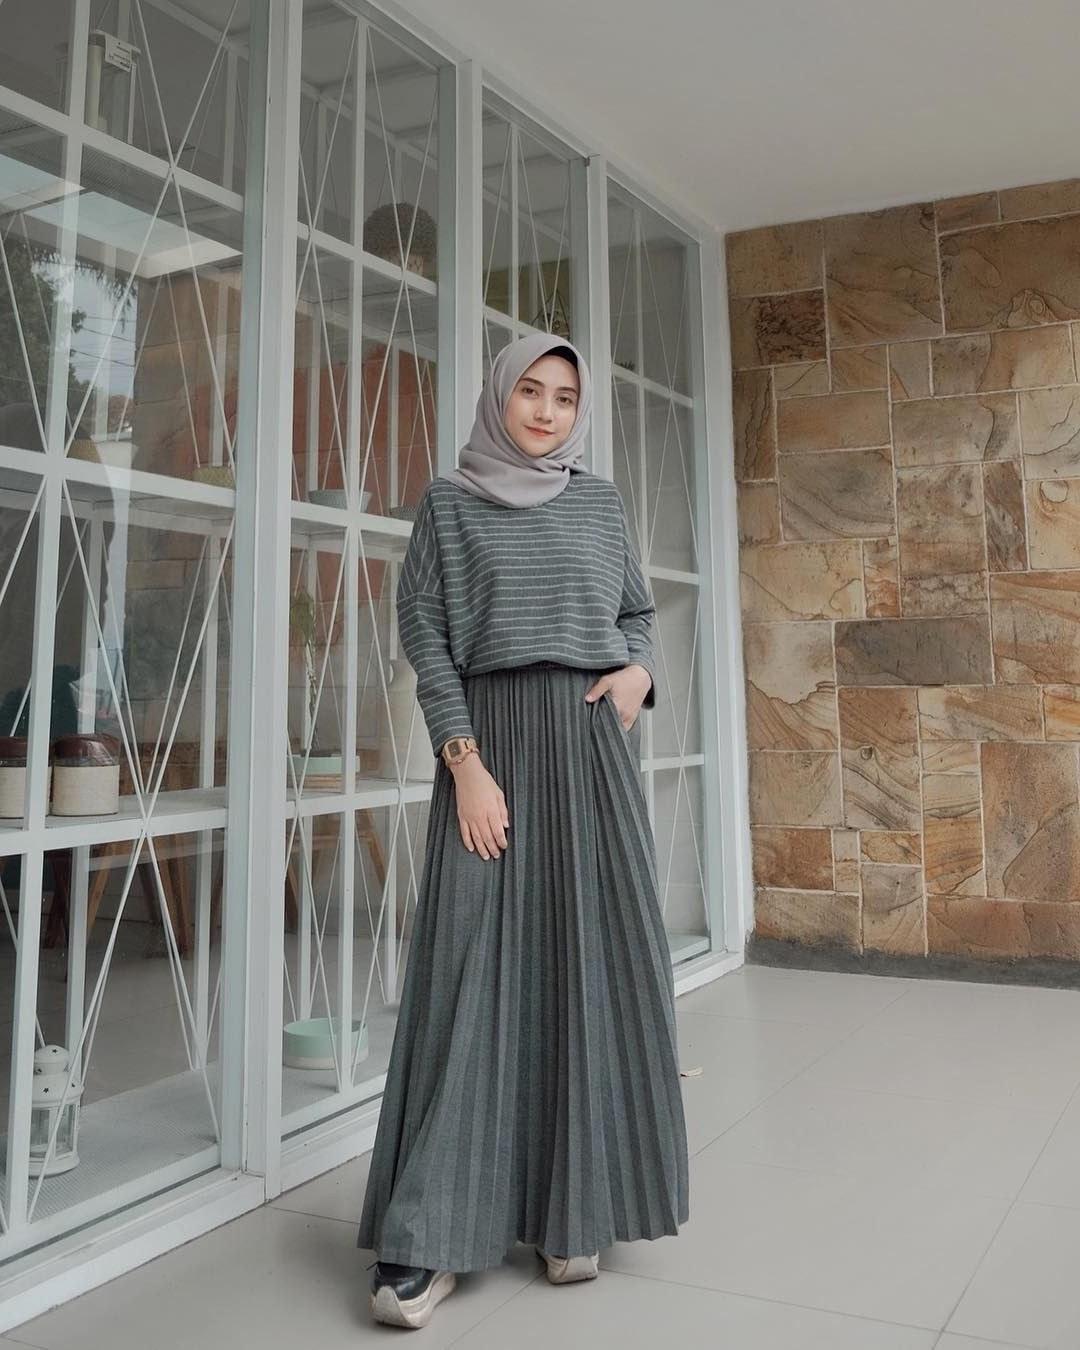 Ide Foto Baju Lebaran Terbaru O2d5 Baju Muslim Lebaran Terbaru 2019 Dengan Gambar